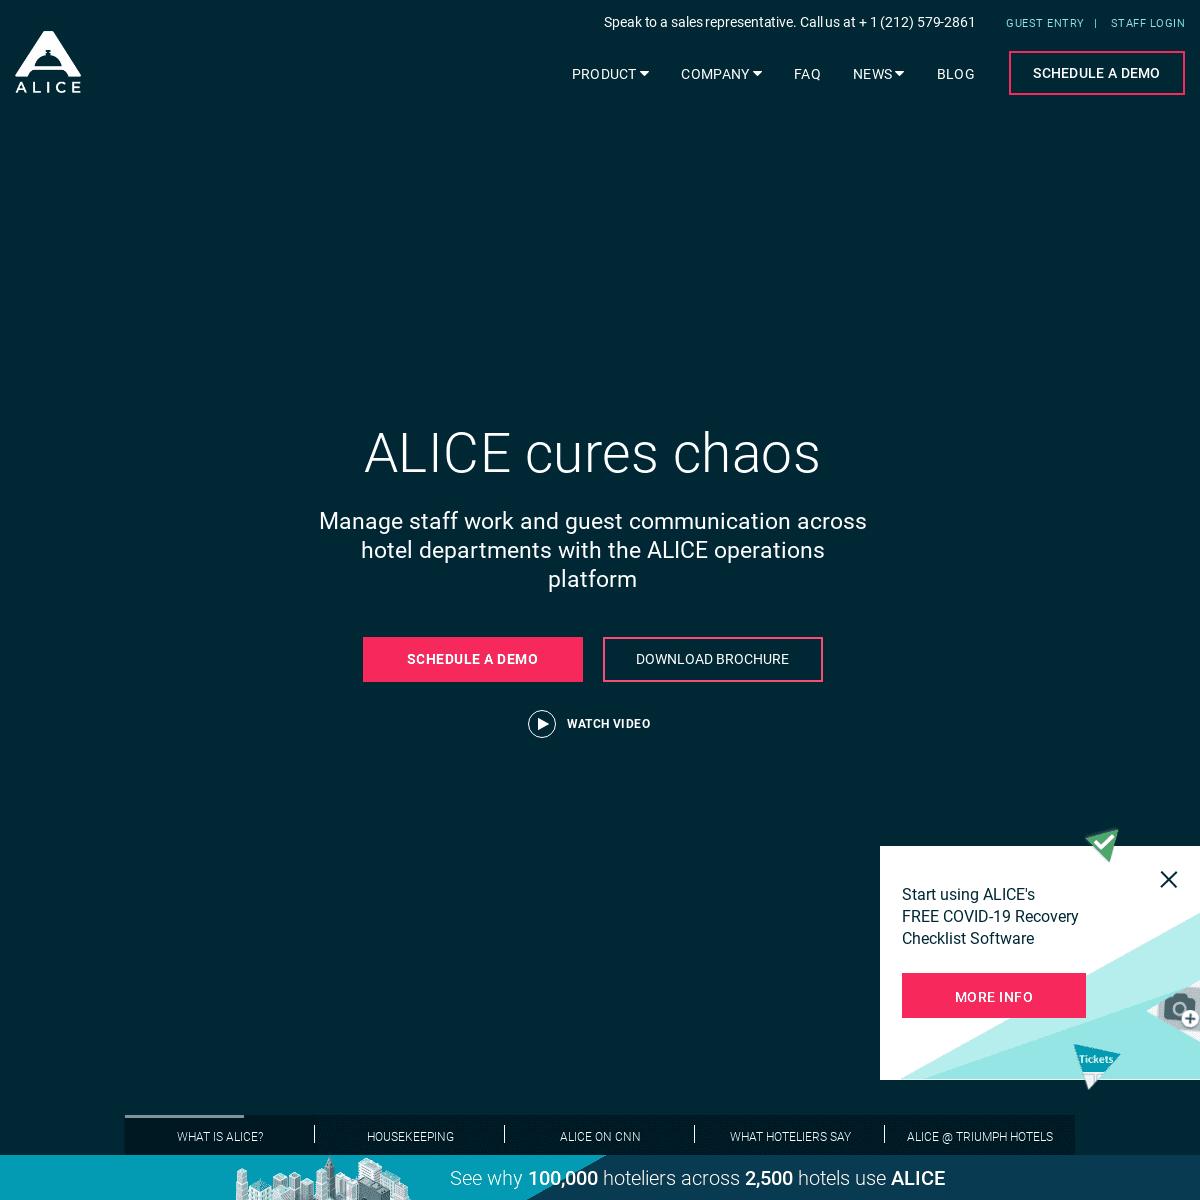 ArchiveBay.com - aliceplatform.com - ALICE - Hotel Operations Platform for Housekeeping, Maintenance, Concierge, Front Desk